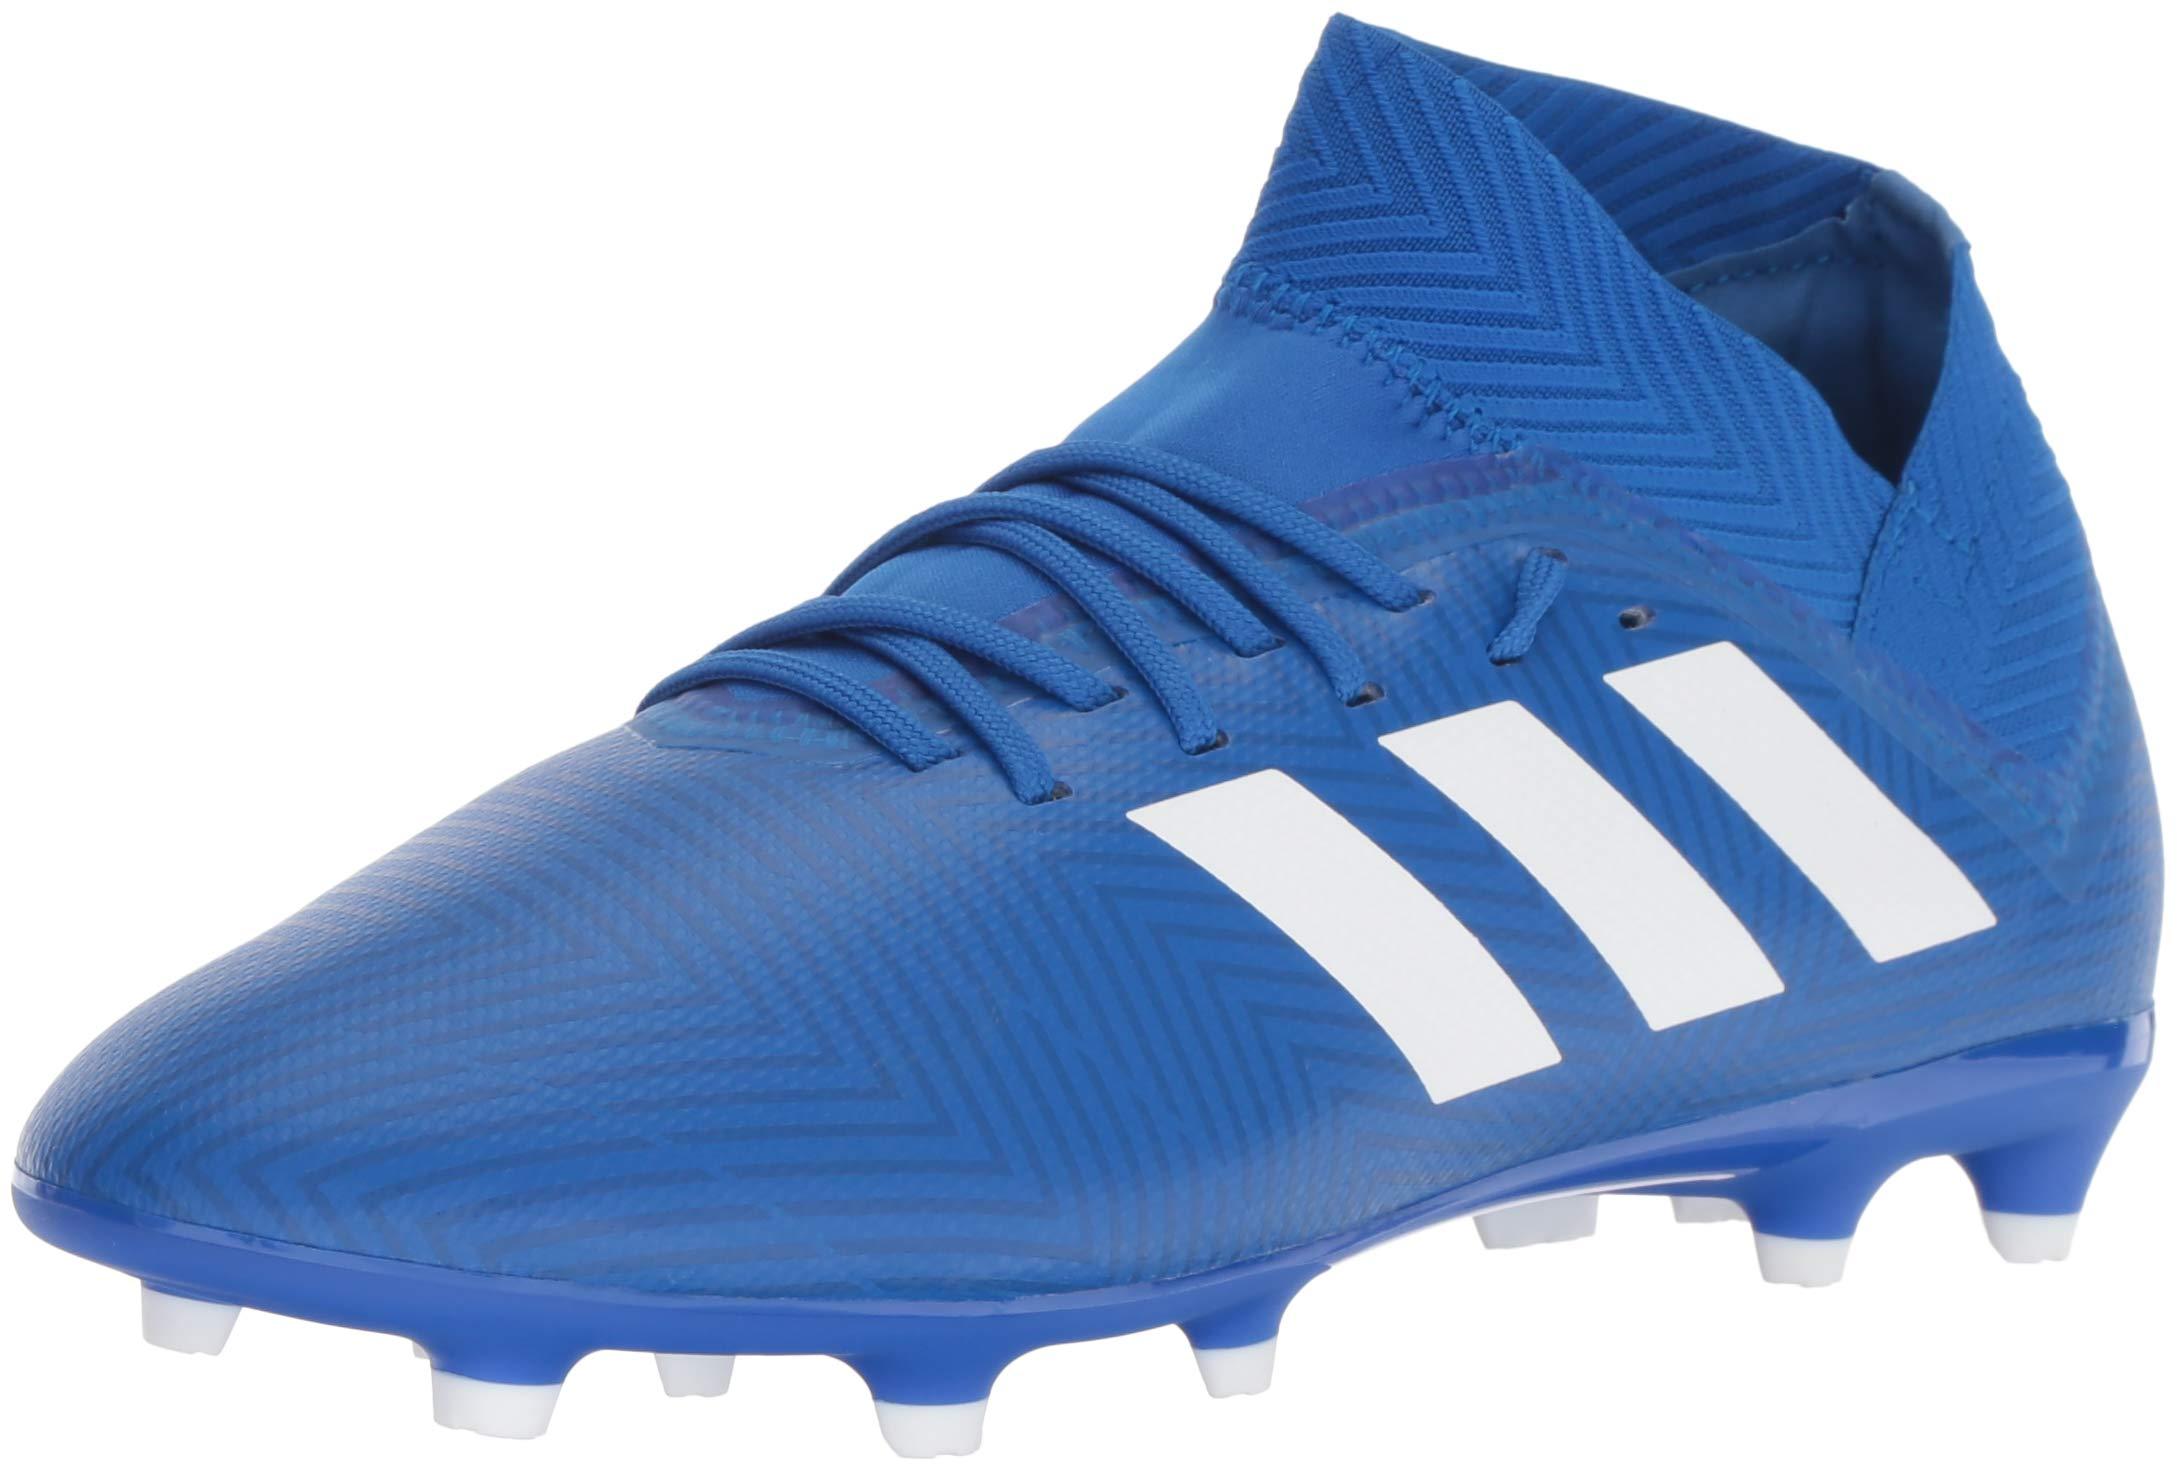 adidas Unisex Nemeziz 18.3 Firm Ground Soccer Shoe, White/Football Blue, 3.5 M US Big Kid